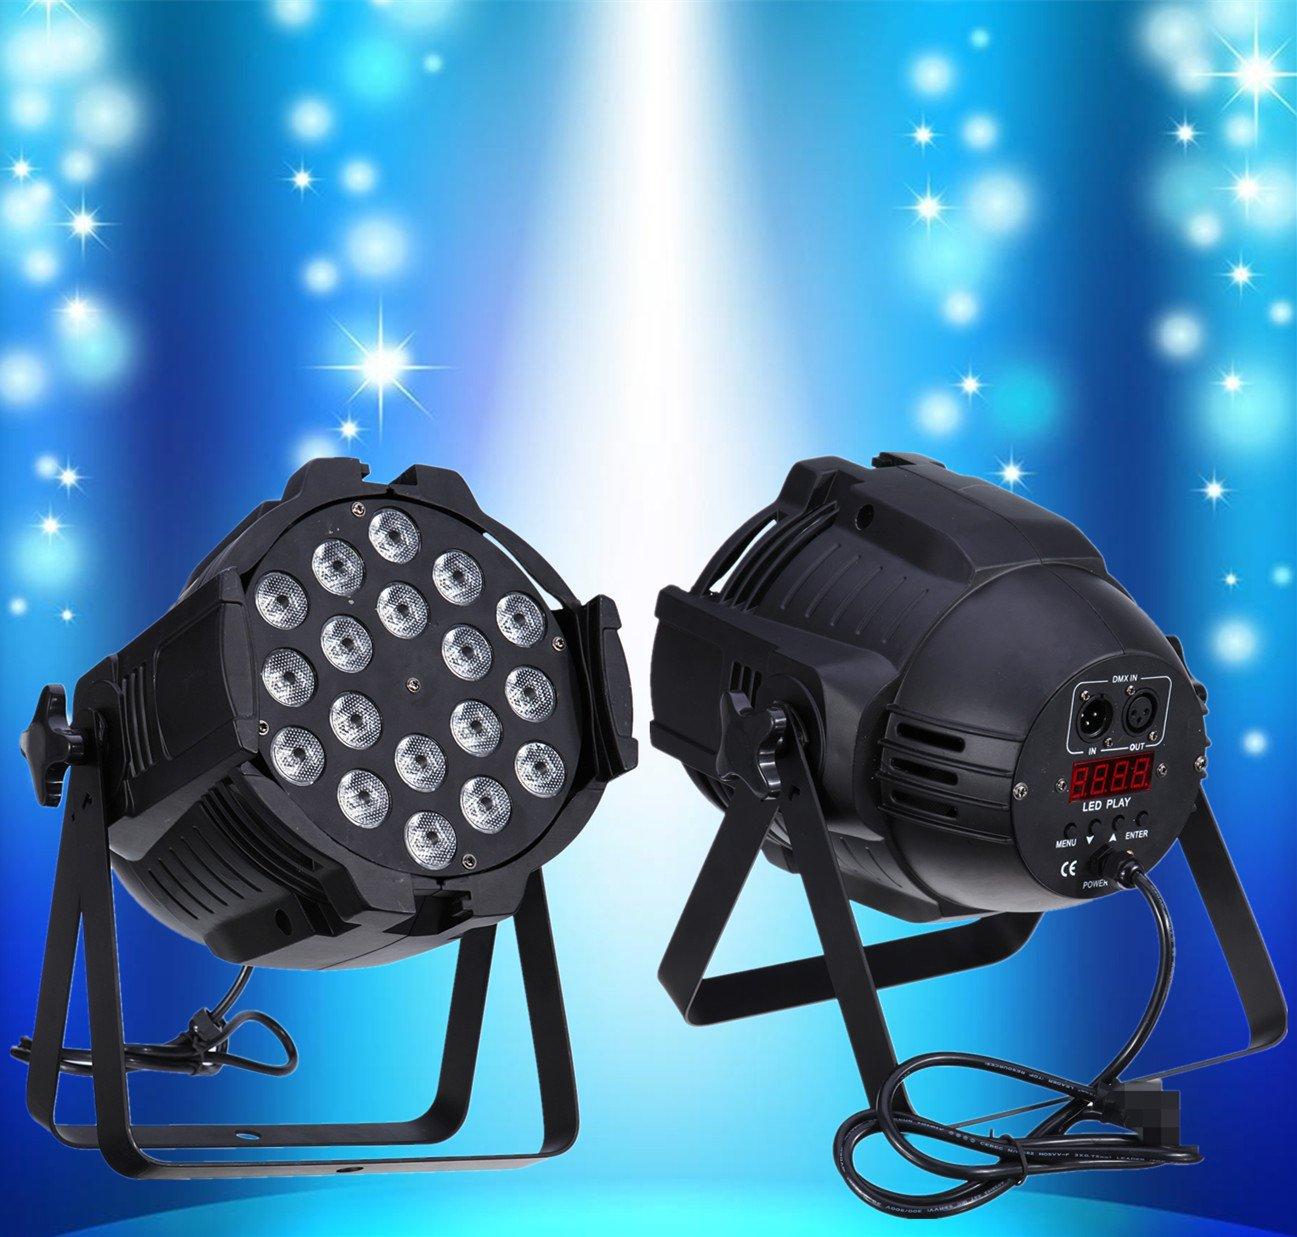 Ridgeyard 2pcs 18x8W RGBW 4 in1 LED 64 Par Lighting DMX512 Stage Party Show DJ Disco Light Lamp Projector